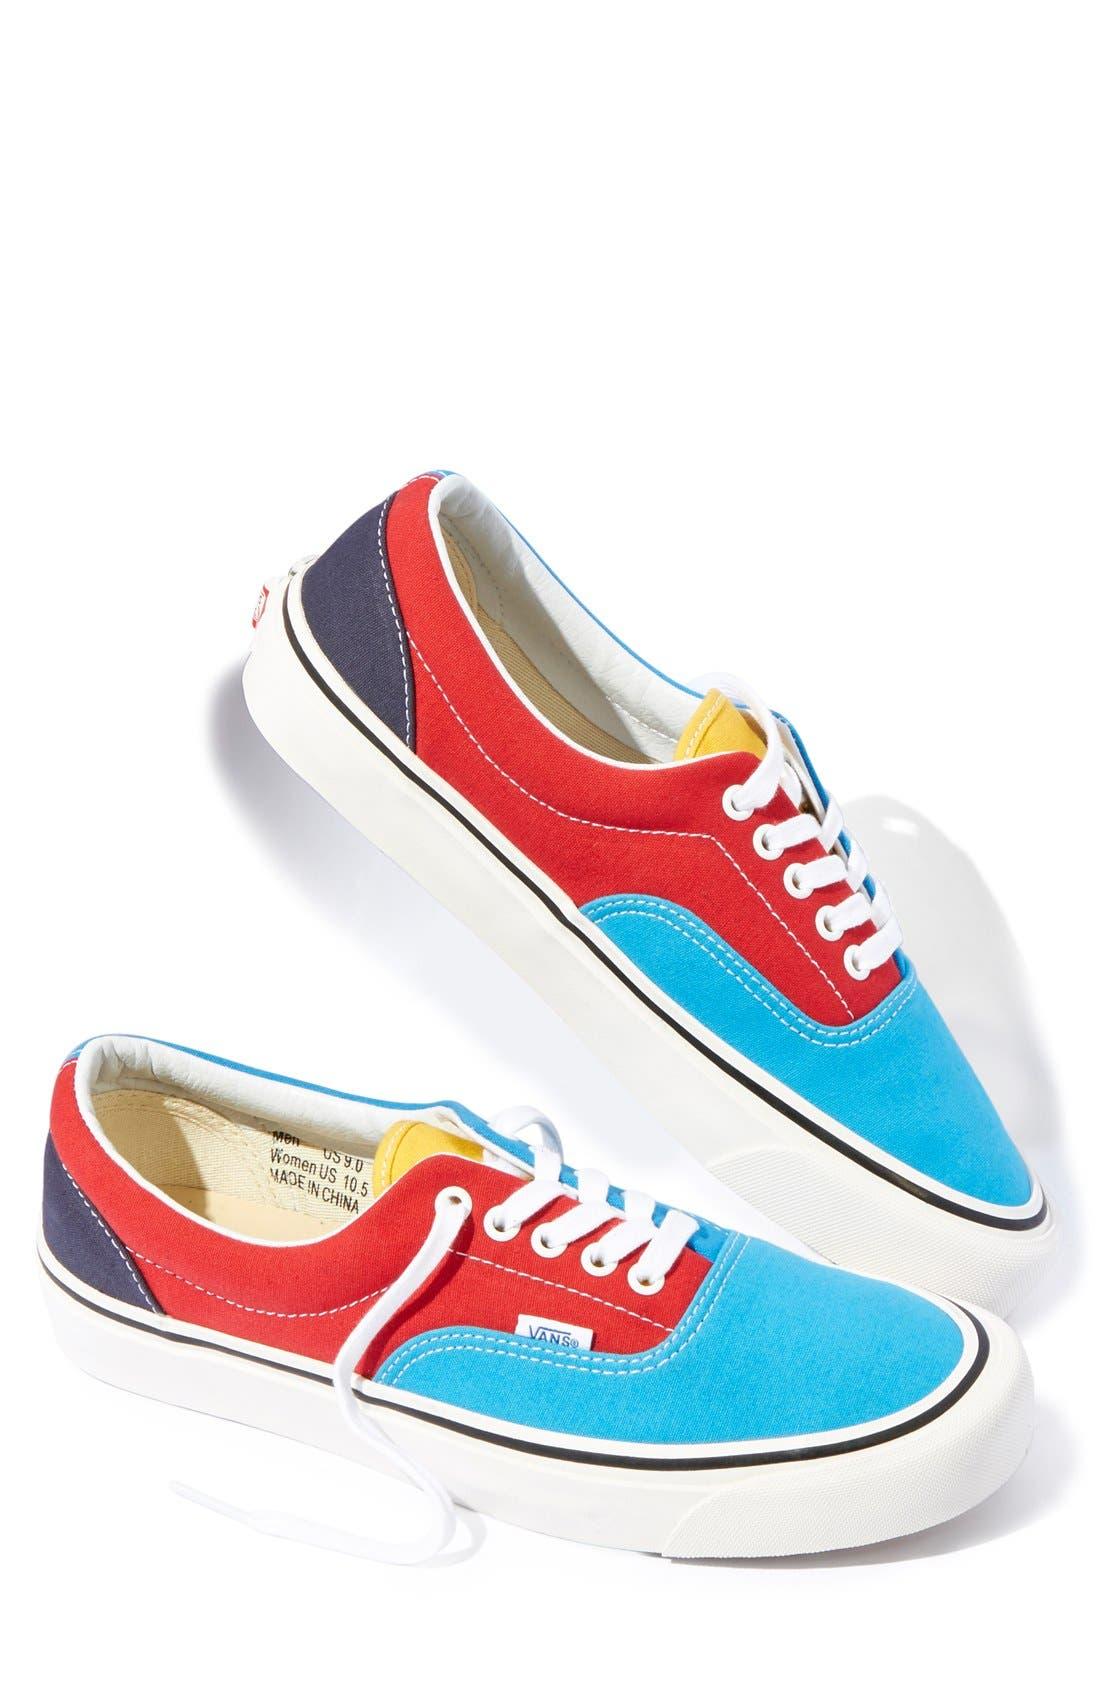 '50th Era 95 Reissue' Low Top Skate Sneaker,                             Main thumbnail 1, color,                             001